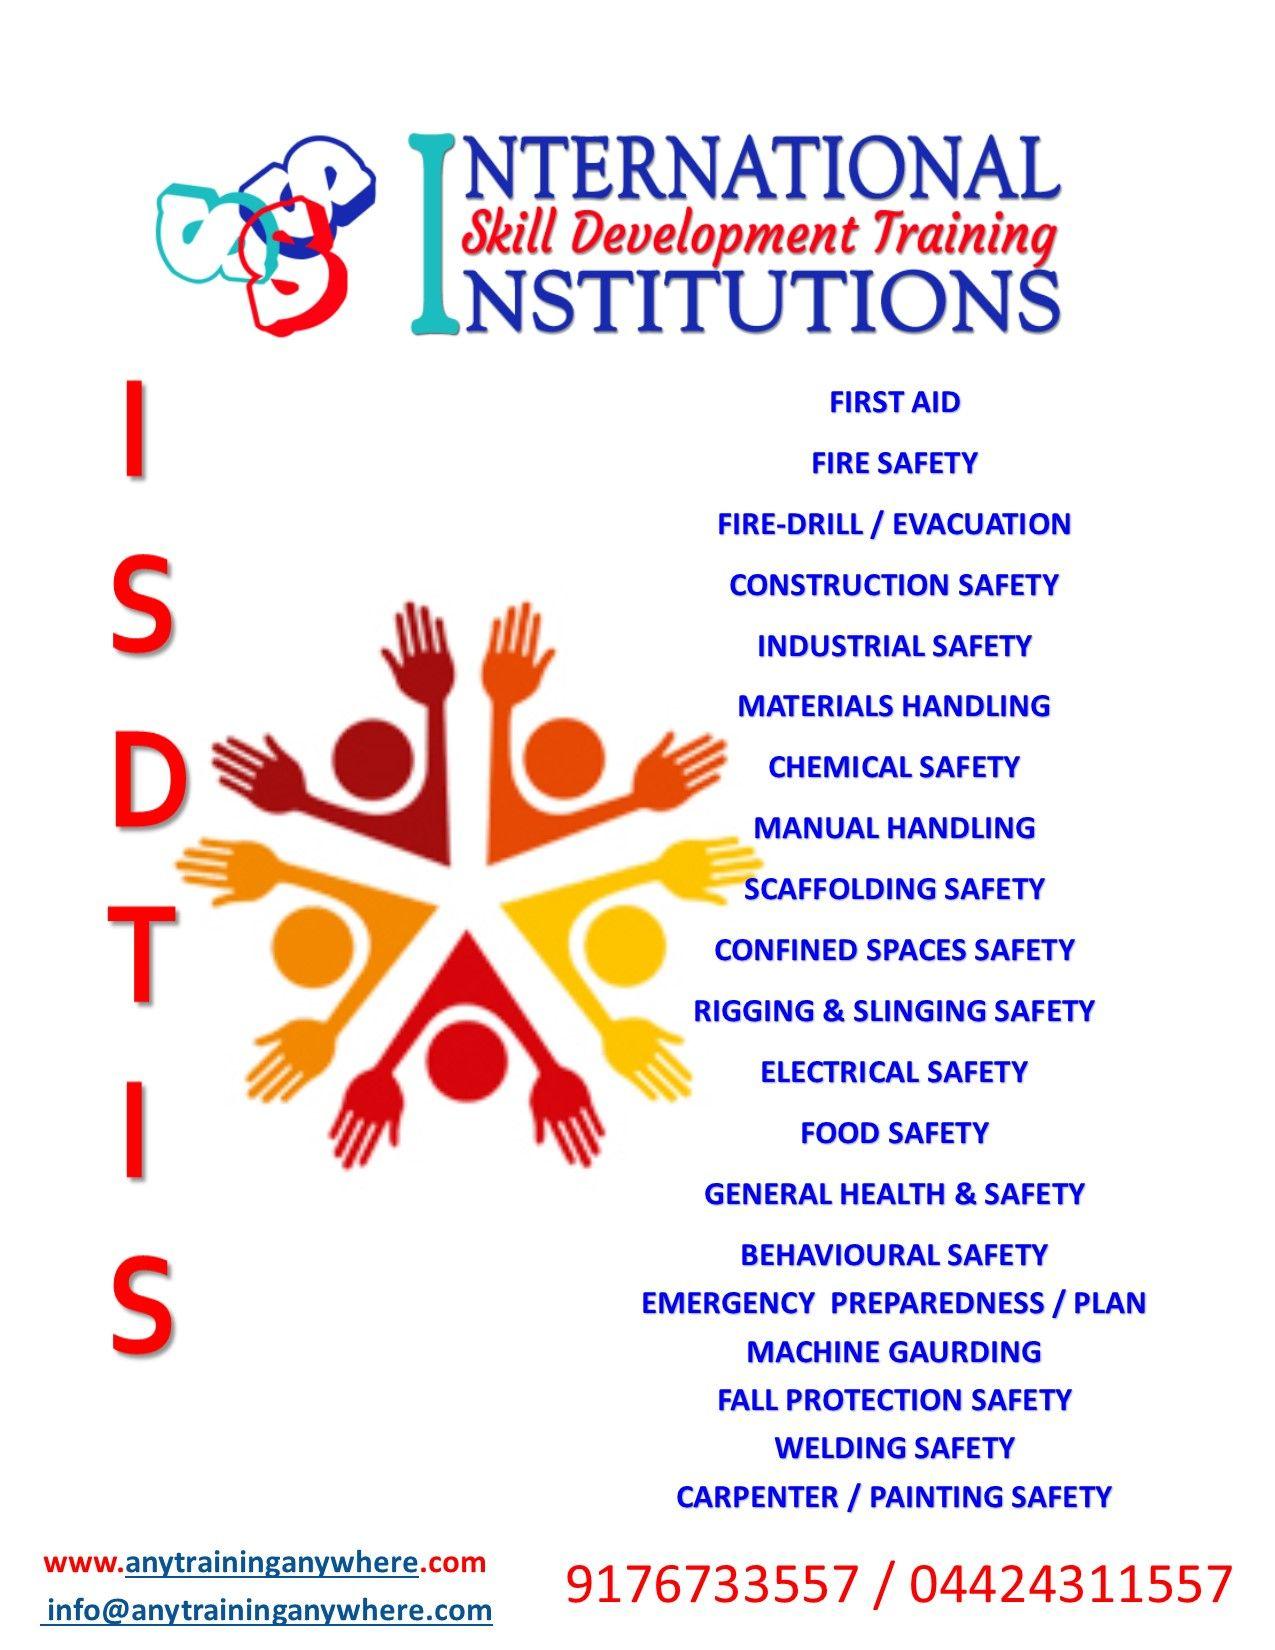 International skill development training institutions chennai best international skill development training institutions chennai best no 1 and leading training institute for 1 xflitez Image collections